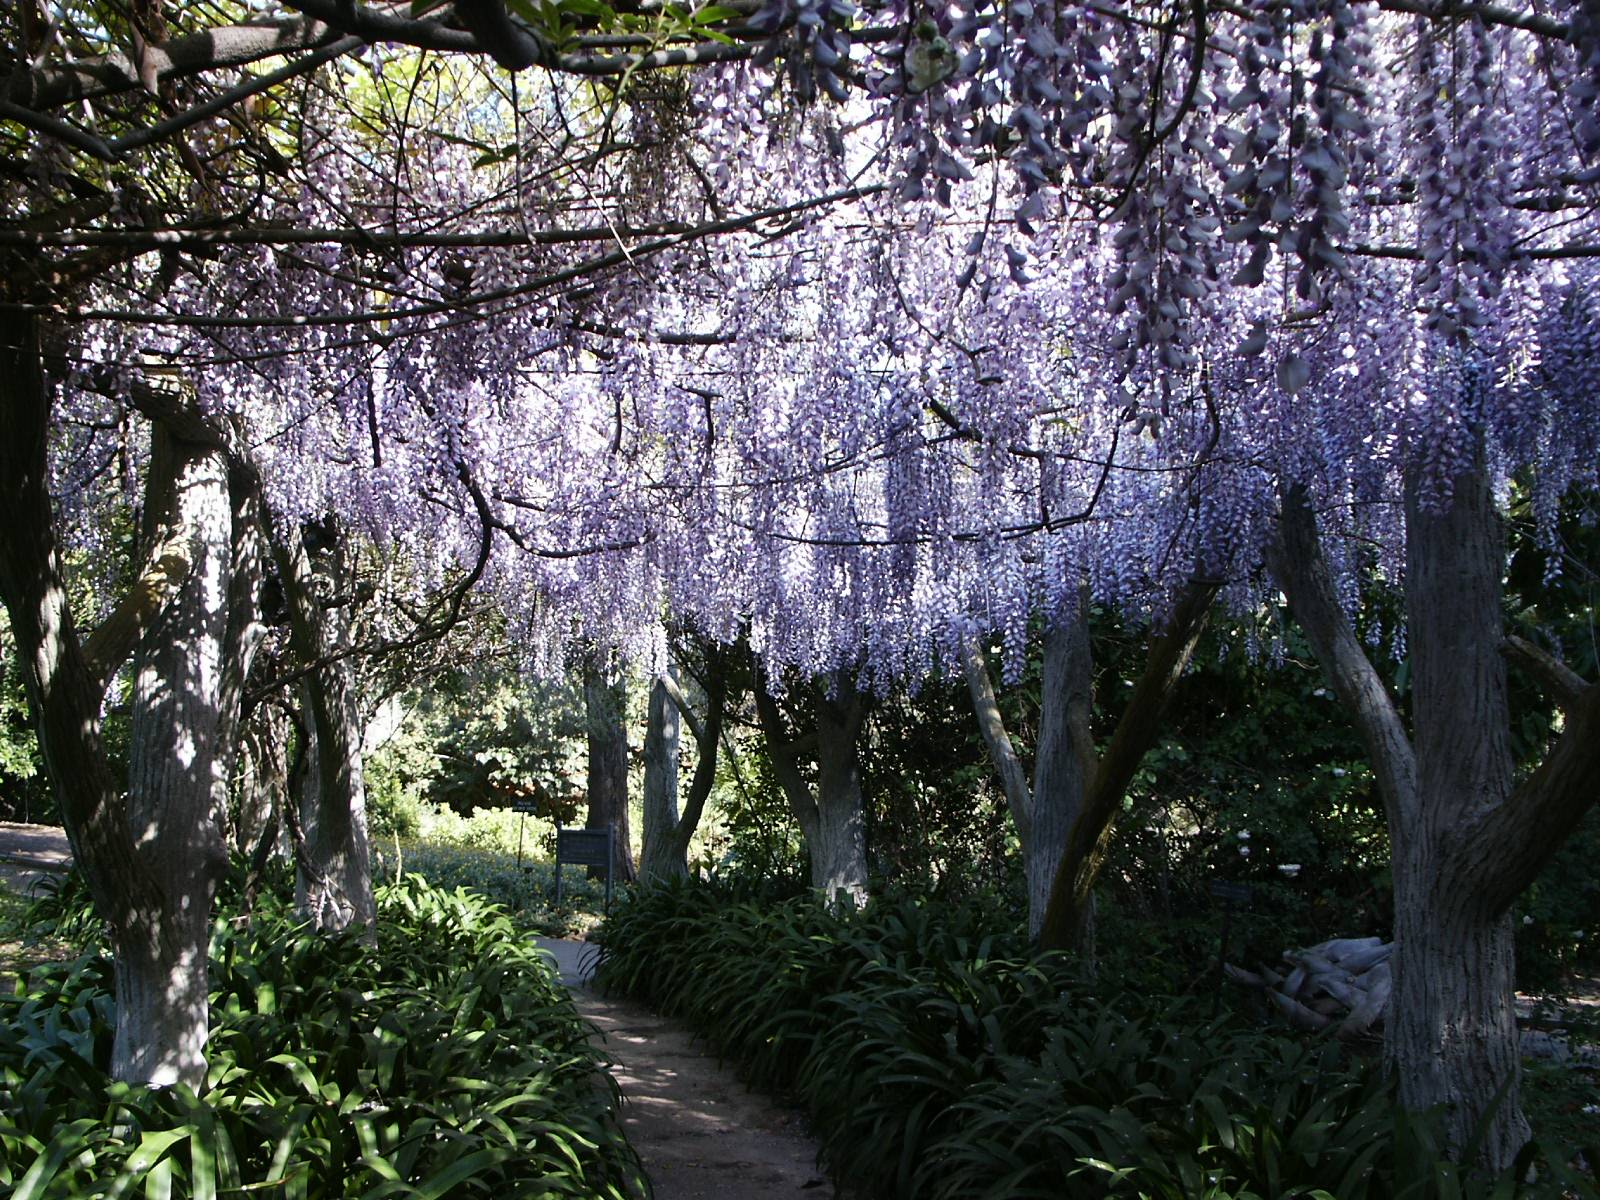 wisteria gardens home design inspiration ideas and pictures